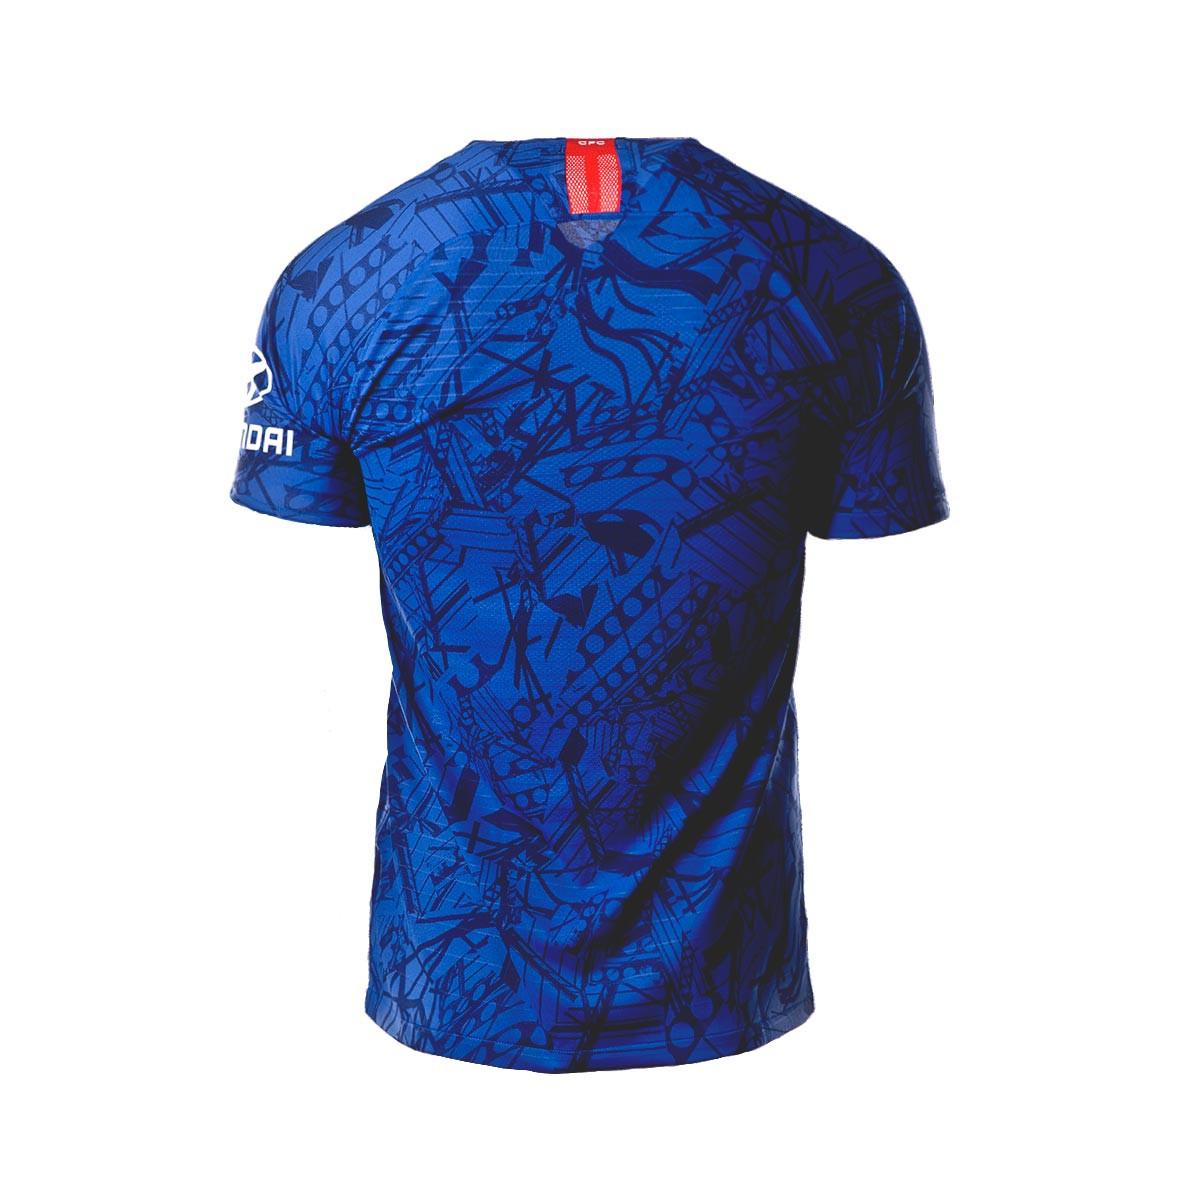 wholesale dealer a7b9f d9dc2 Camiseta Chelsea FC Vapor Match SS Primera Equipación 2019-2020 Rush  blue-White